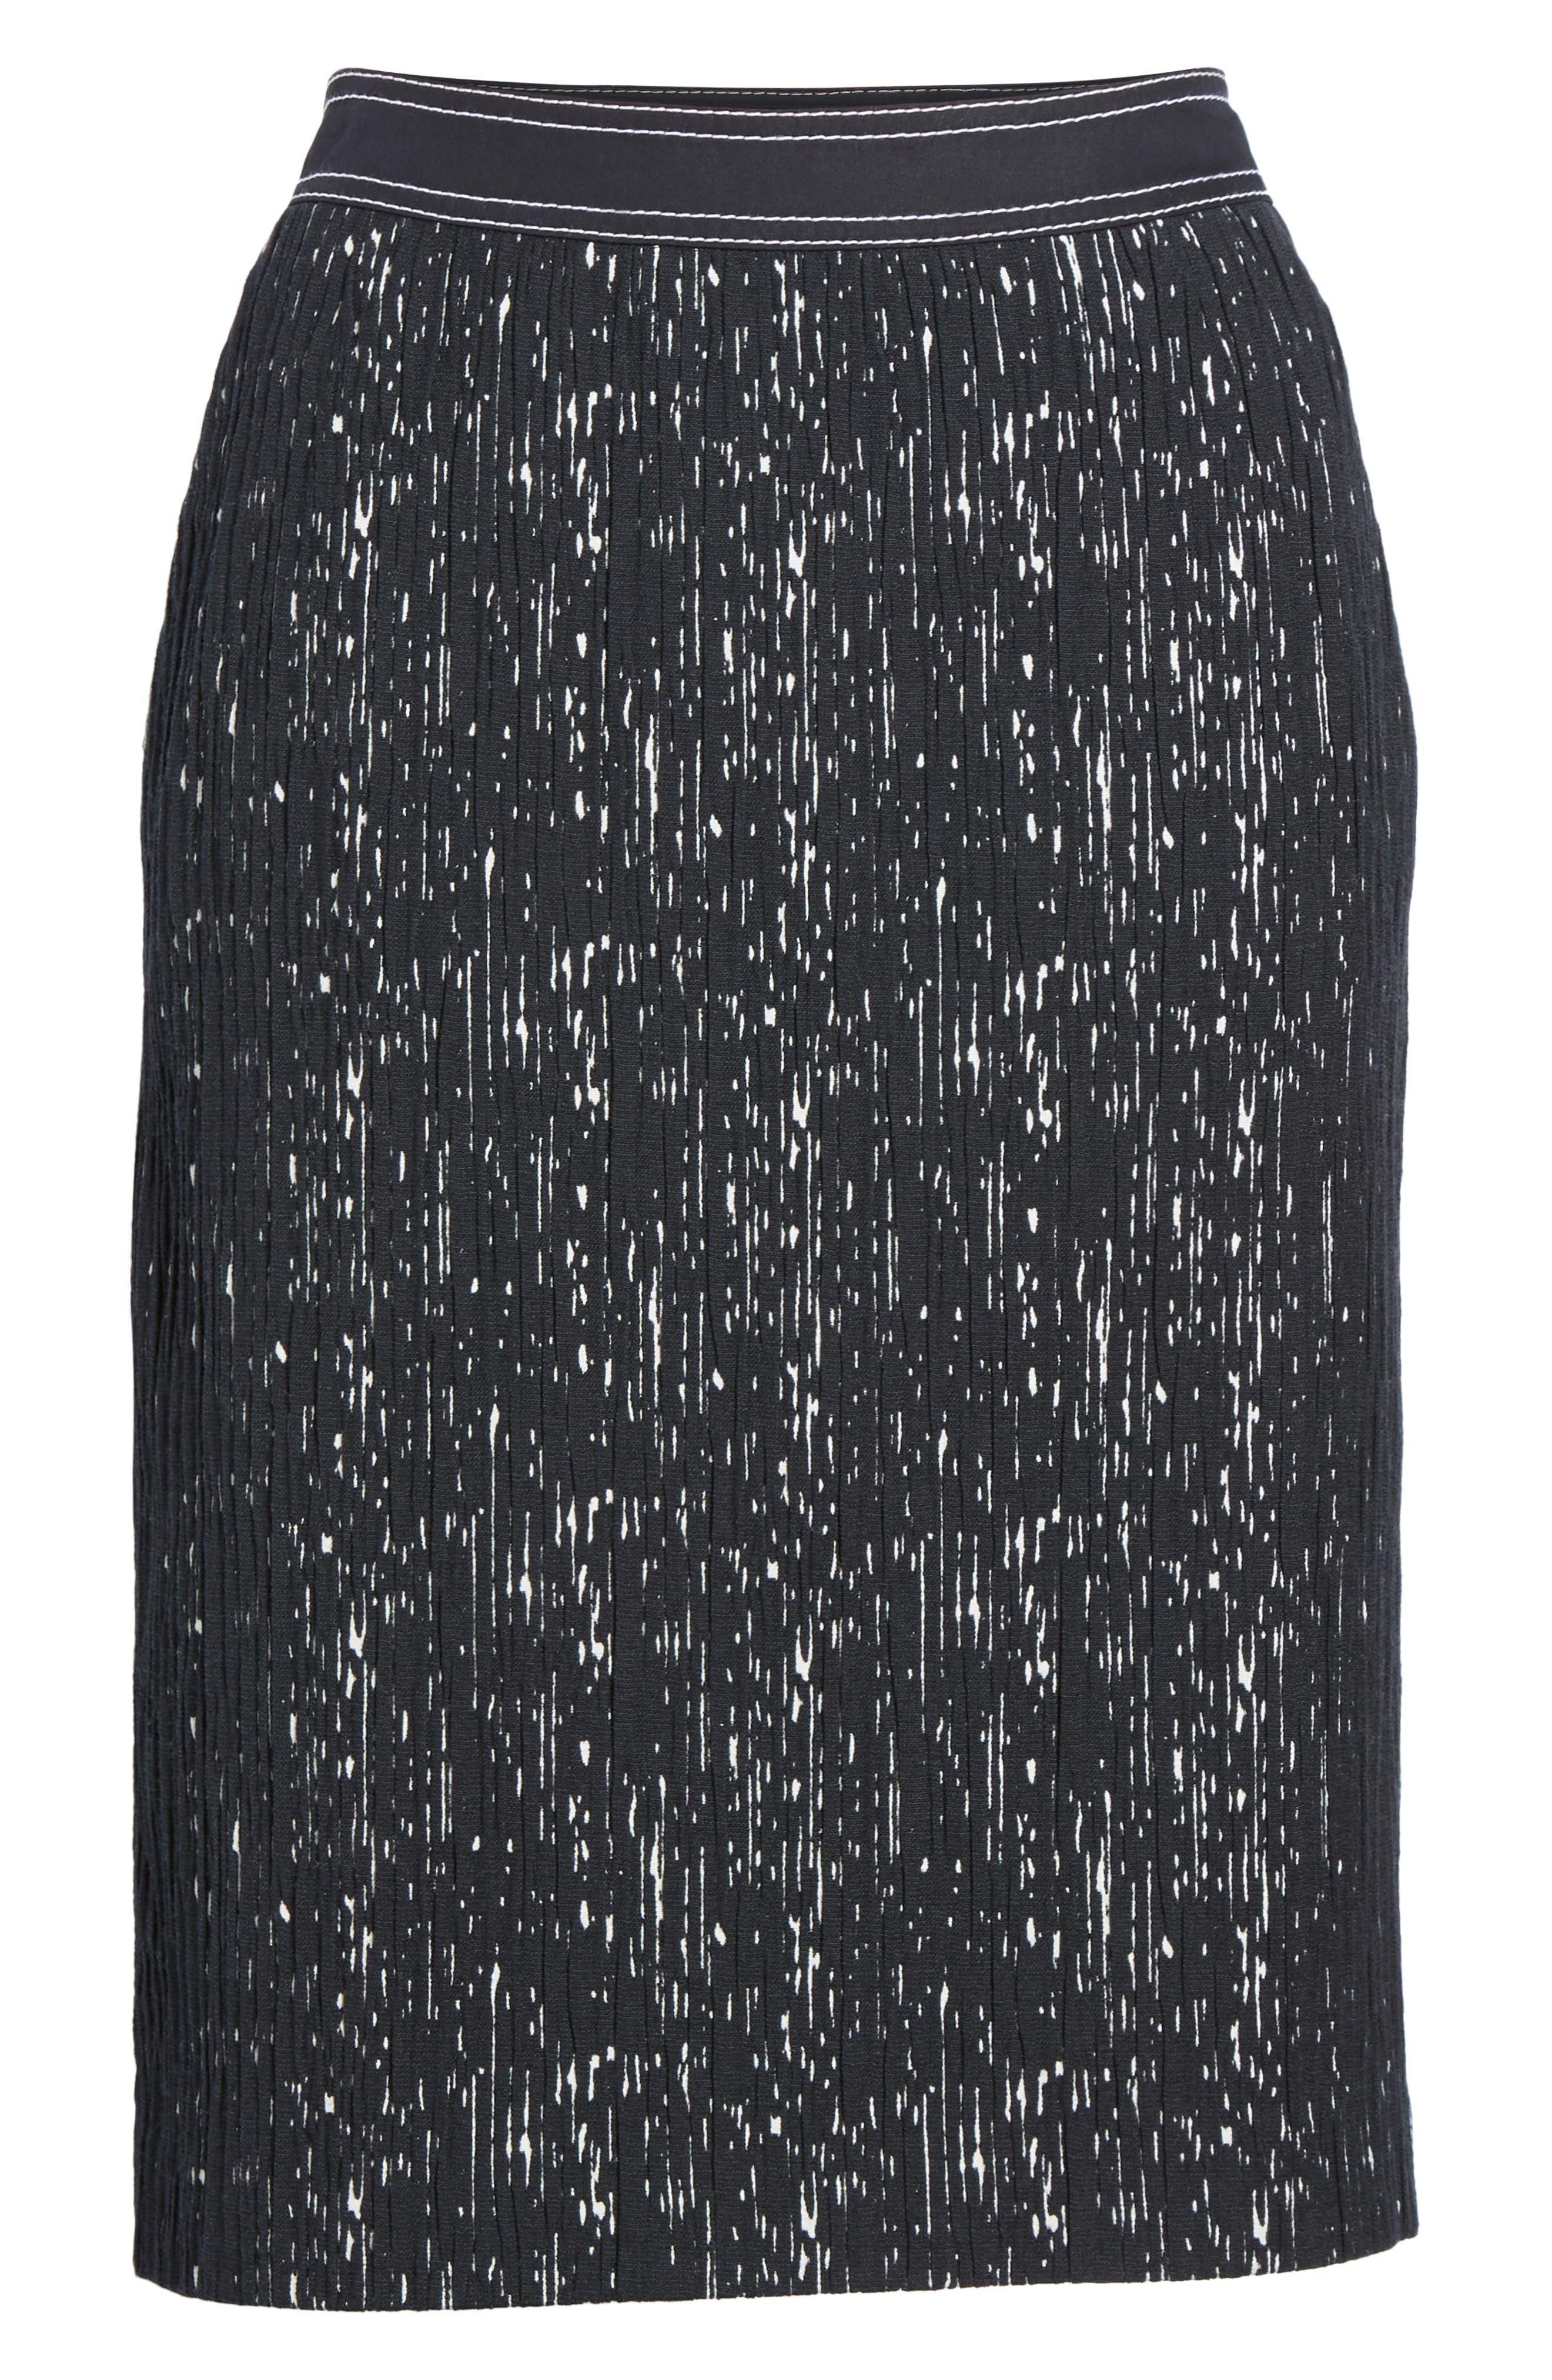 Veleara Pencil Skirt,                             Alternate thumbnail 6, color,